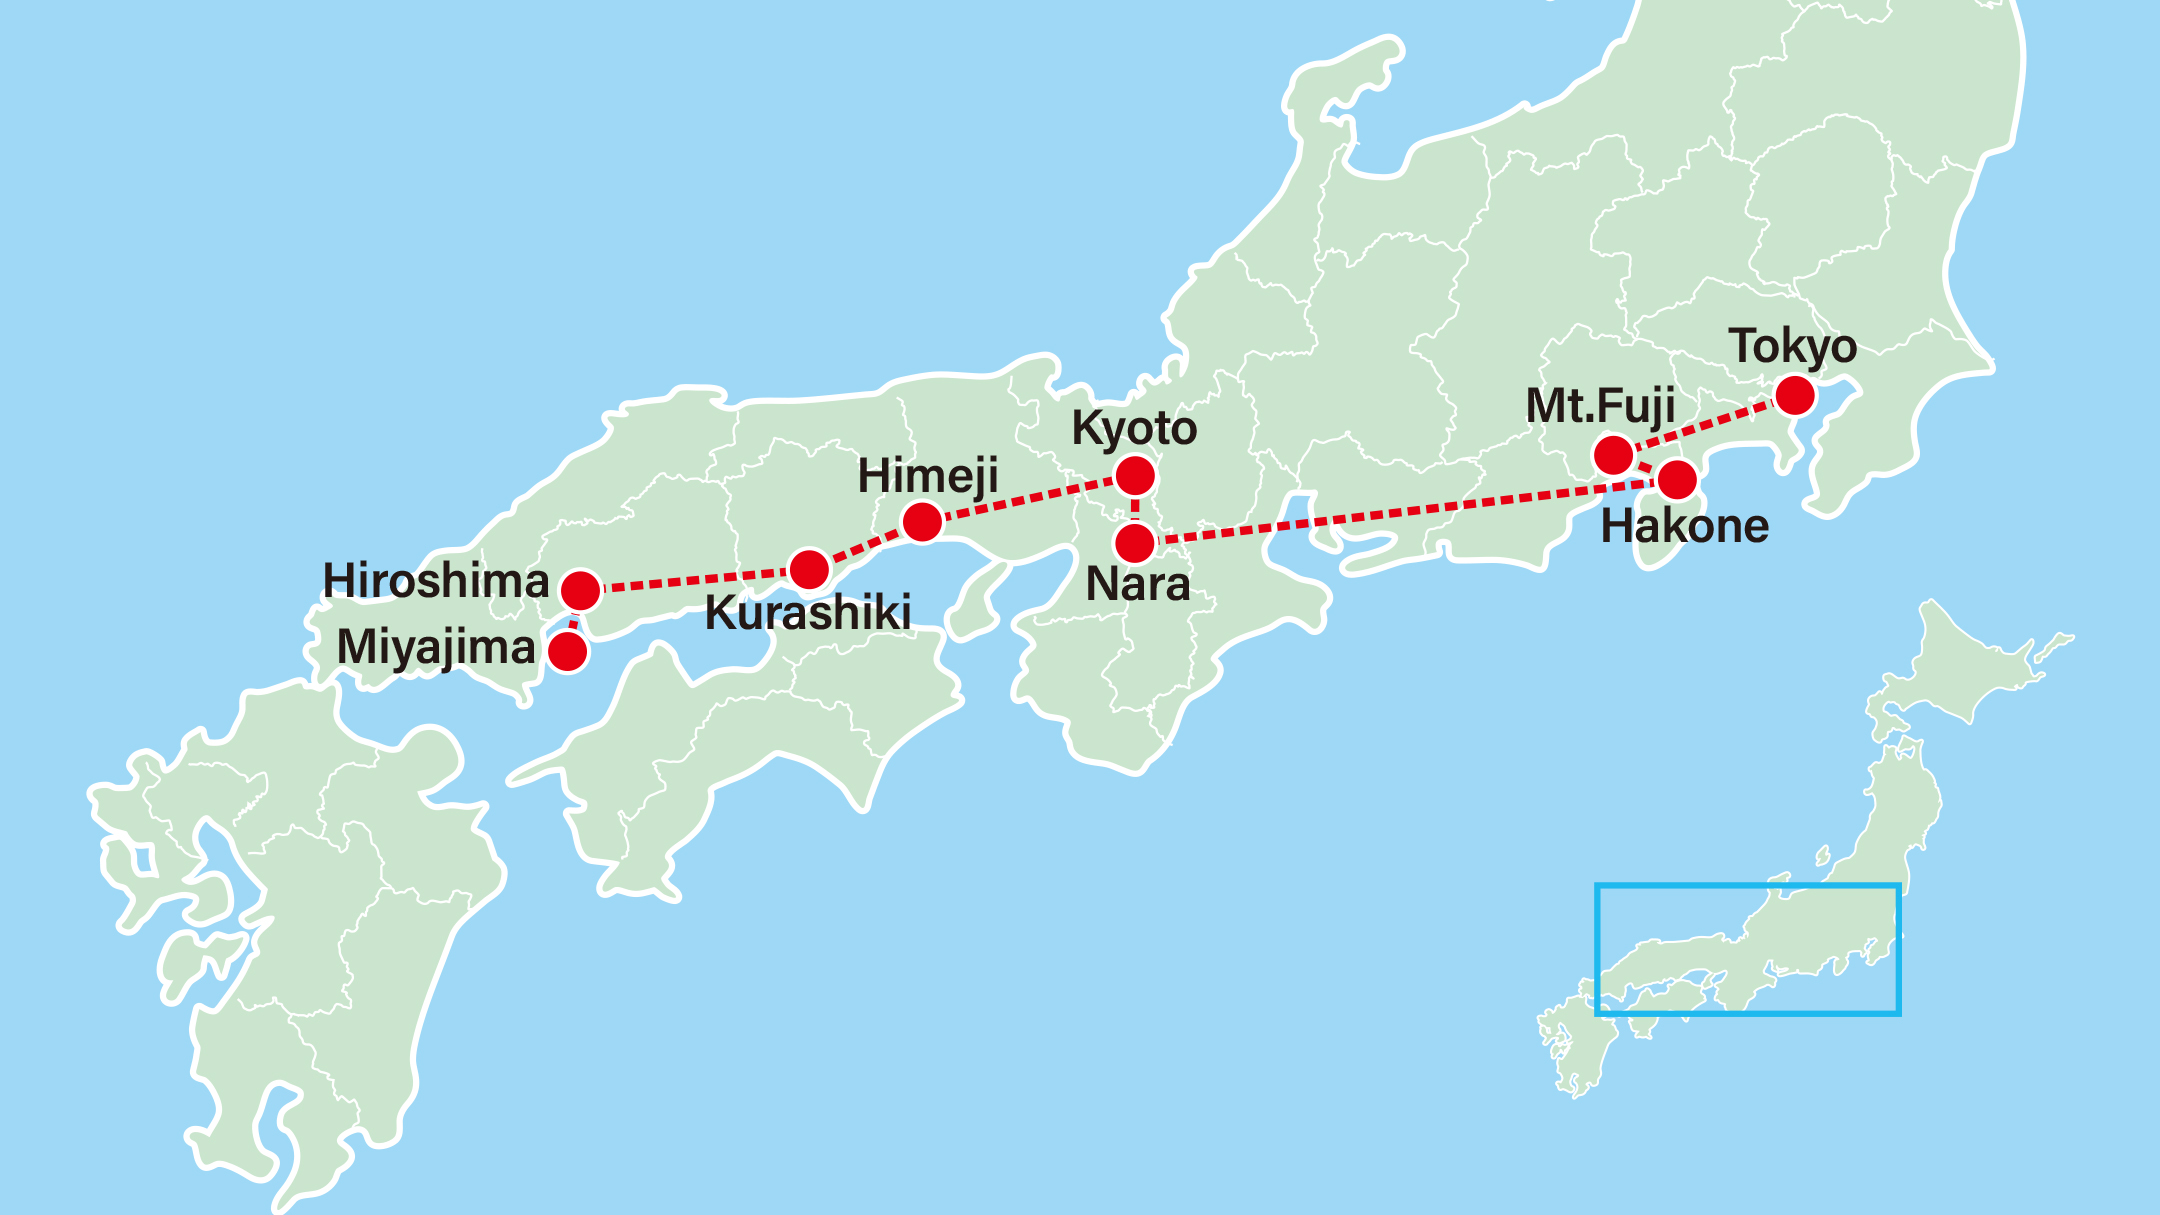 Kyoto Gion Festival 10 Days-Tokyo-Hakone-Kyoto-Gion Festival-Nara-Himeji-Kurashiki-Hiroshima-Miyajima